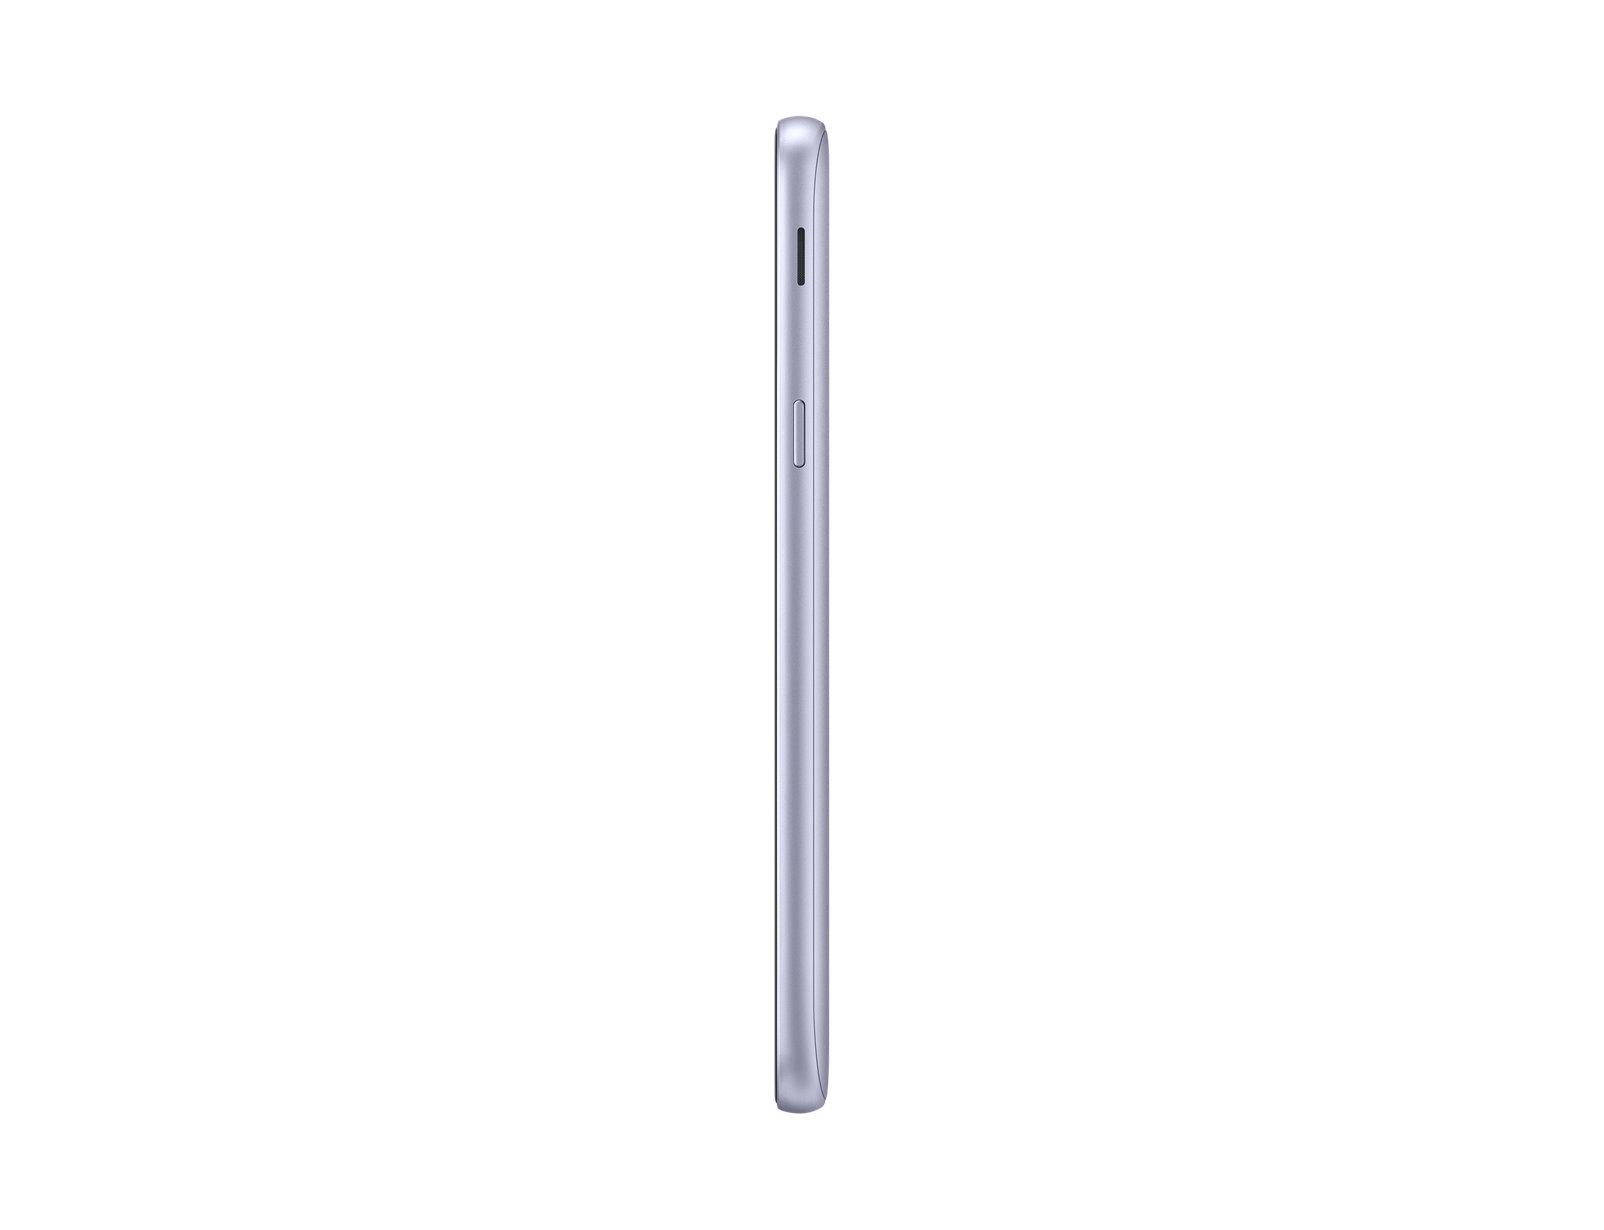 Samsung SM-J600FN